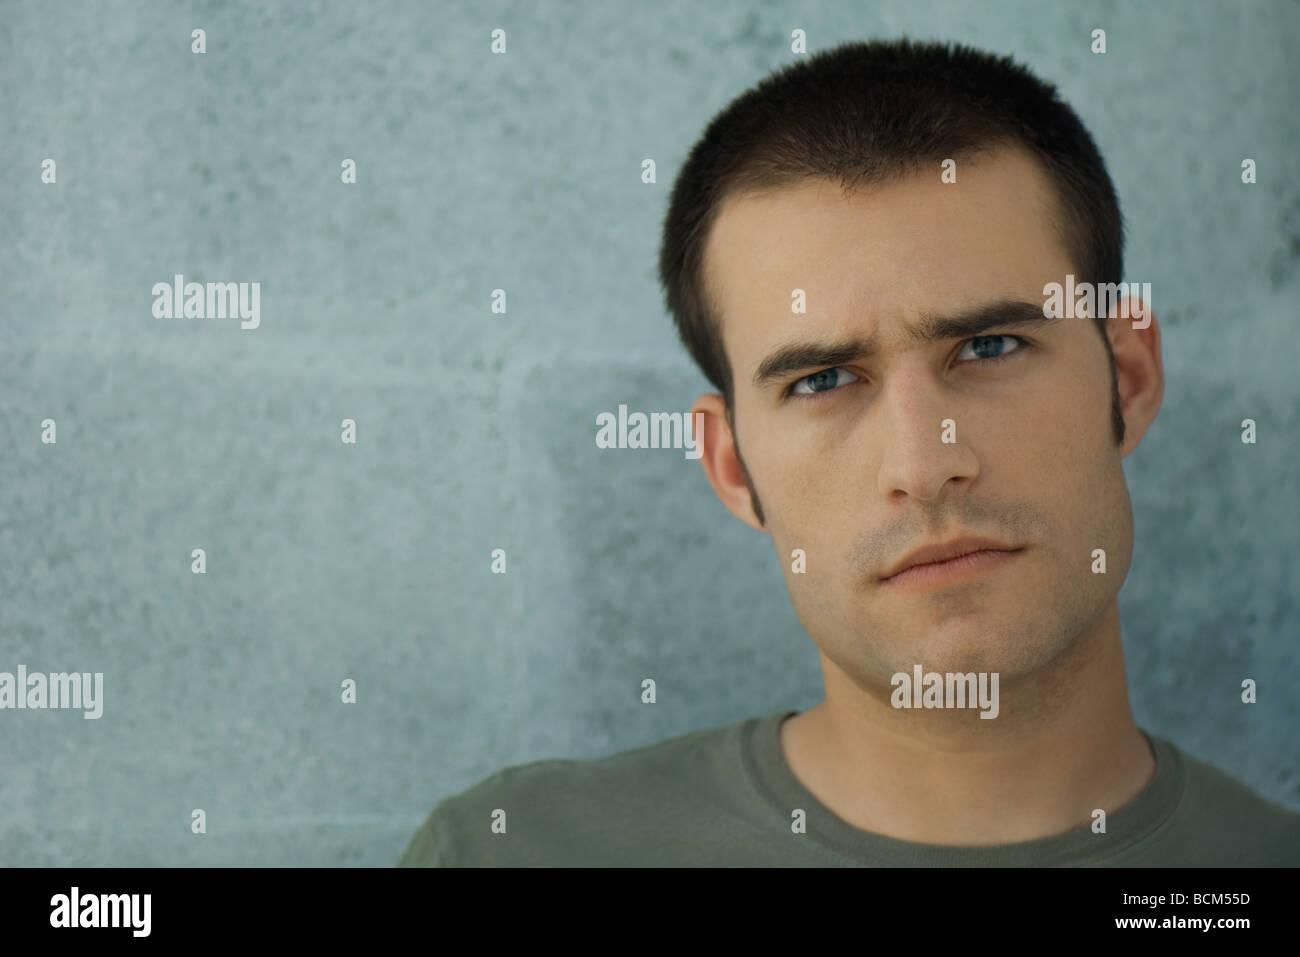 Man furrowing brow, frowning - Stock Image